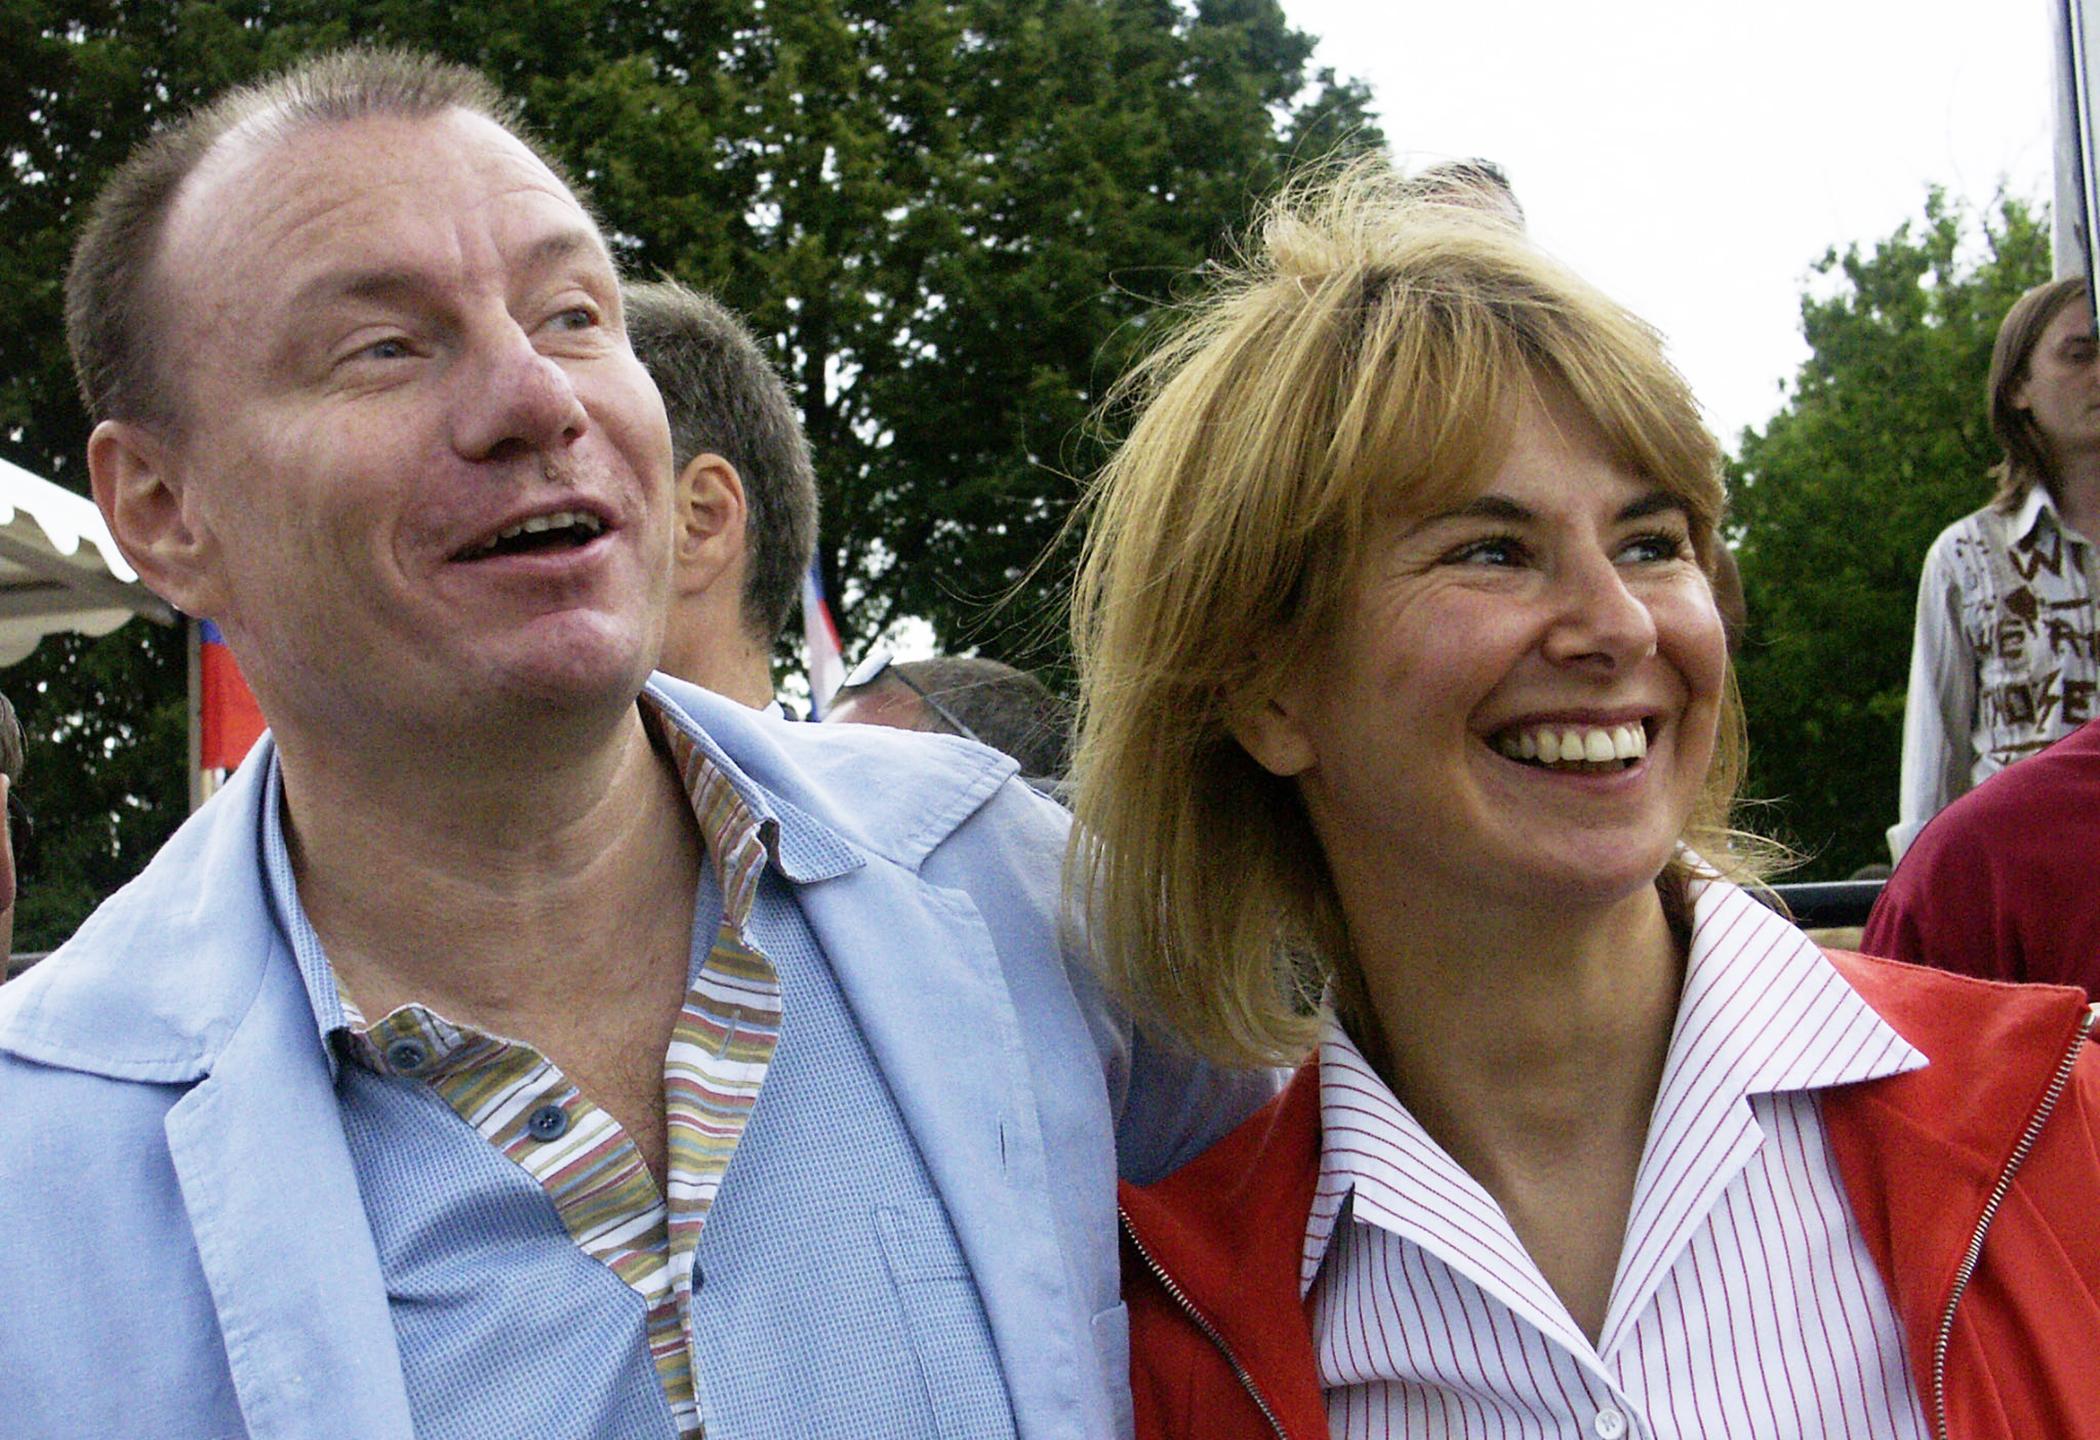 Vladimir Potanin with wife Natalia Potanina at